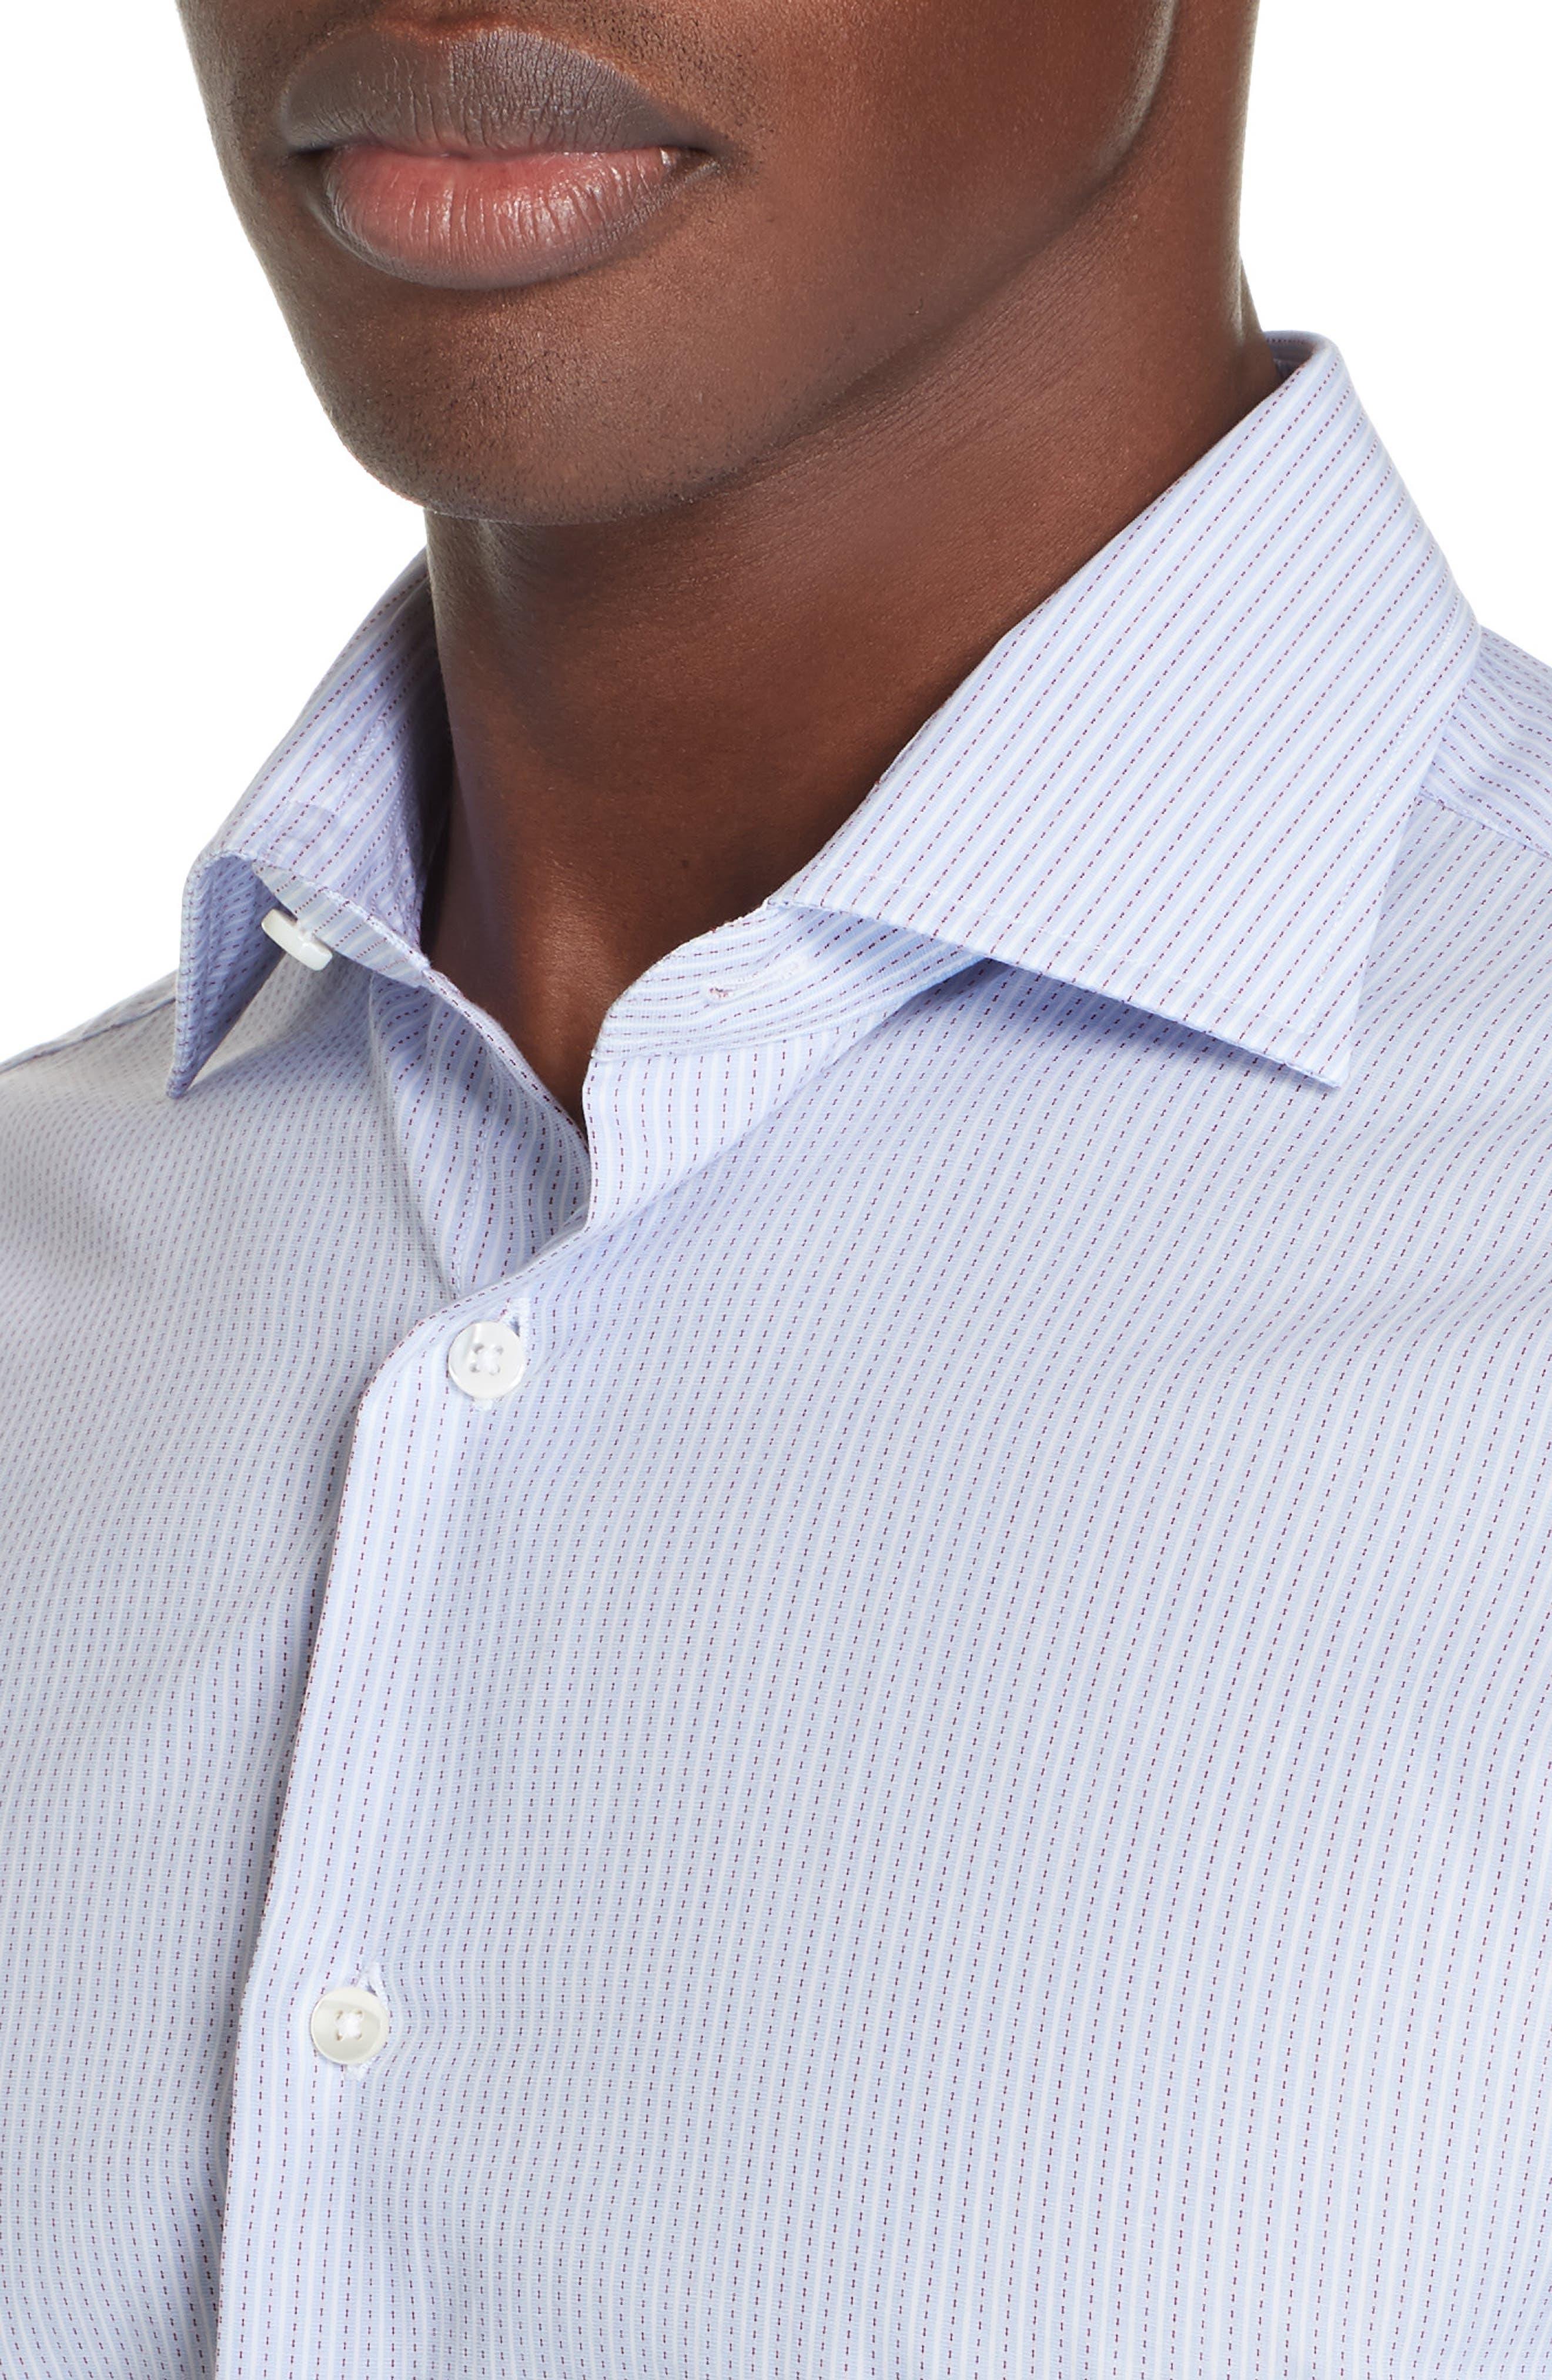 Trim Fit Stripe Dress Shirt,                             Alternate thumbnail 2, color,                             MED BLUE